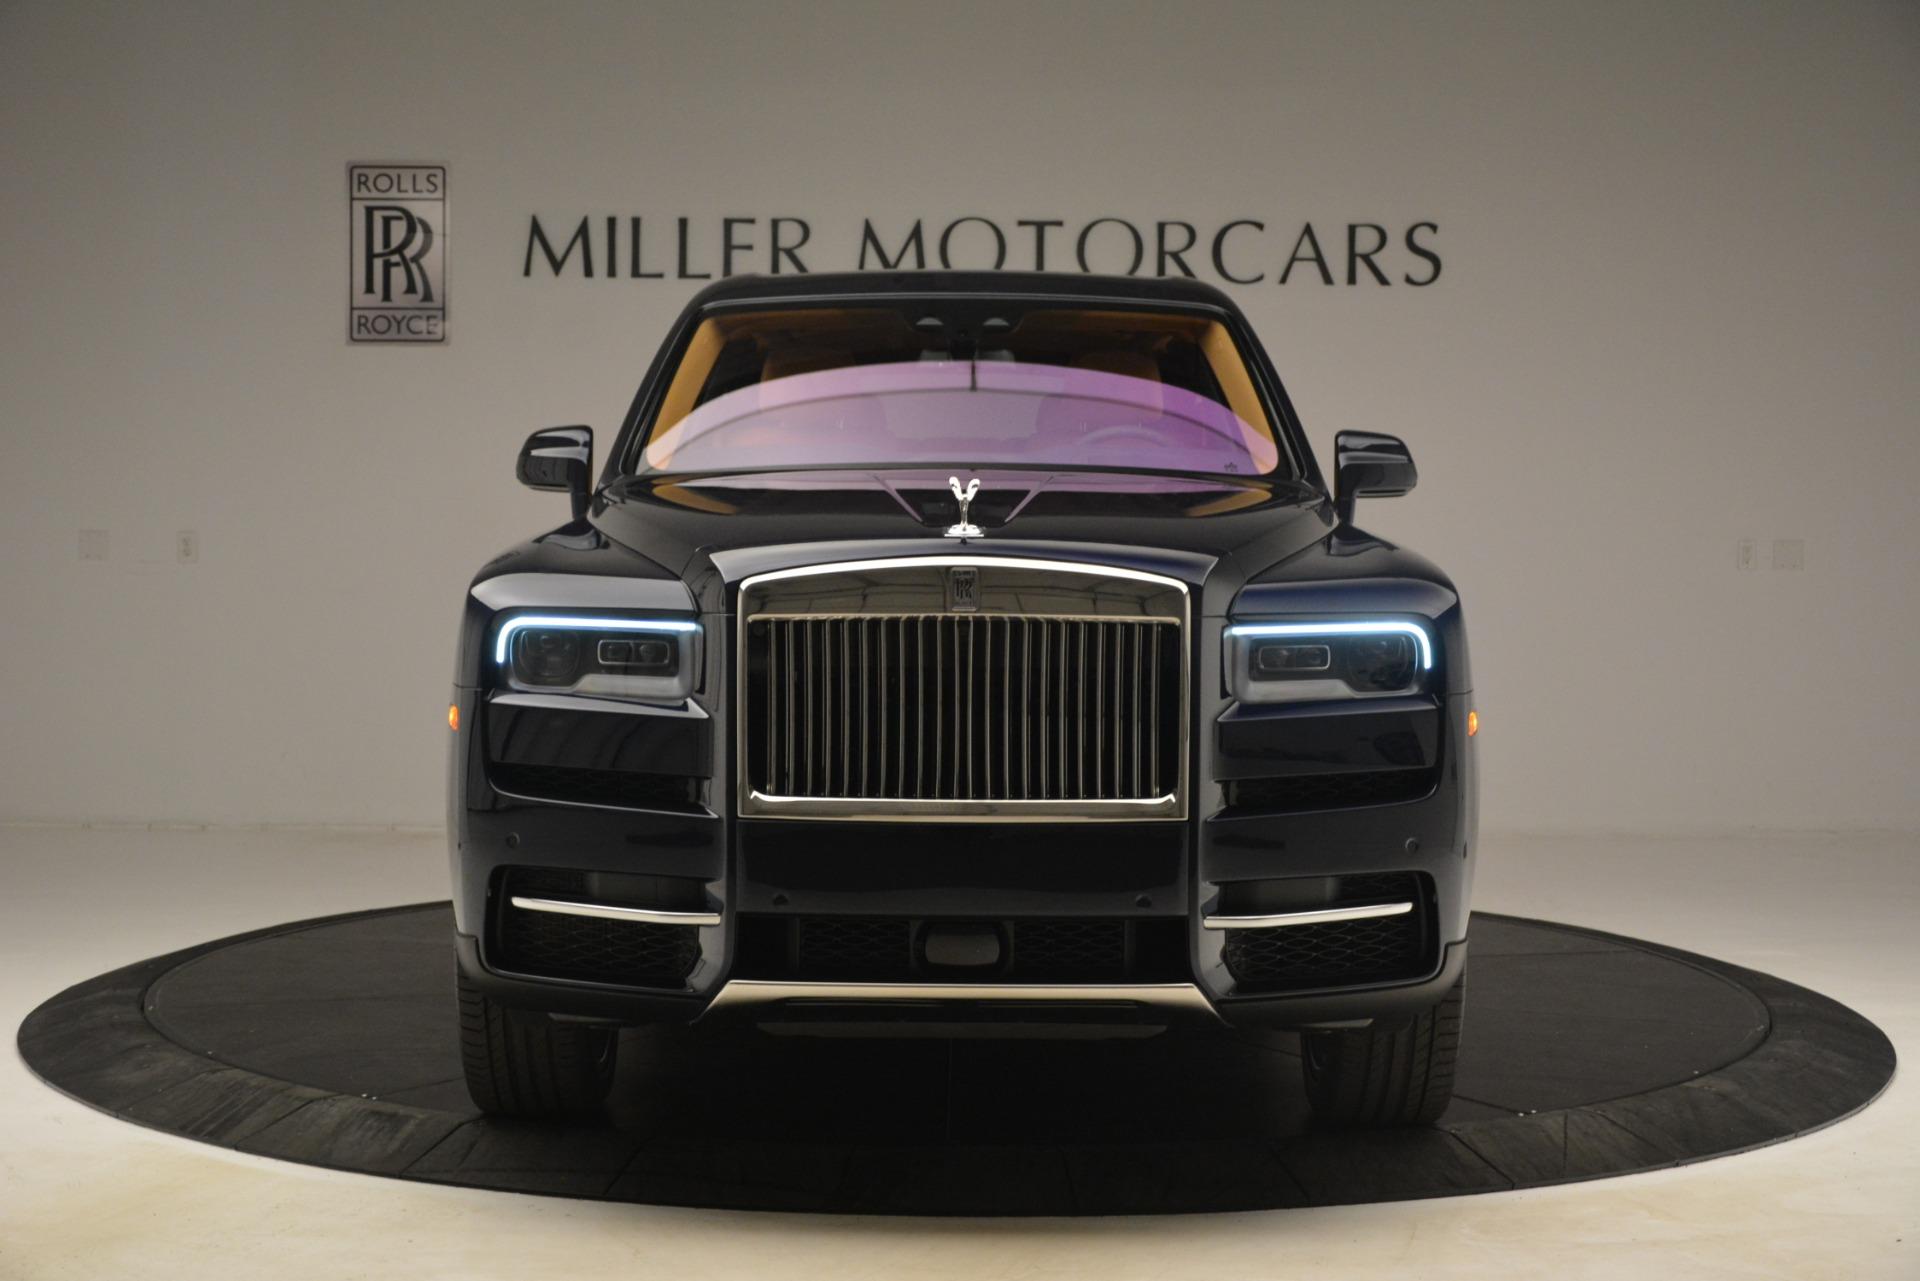 New 2019 Rolls-Royce Cullinan  For Sale In Greenwich, CT 3223_p2